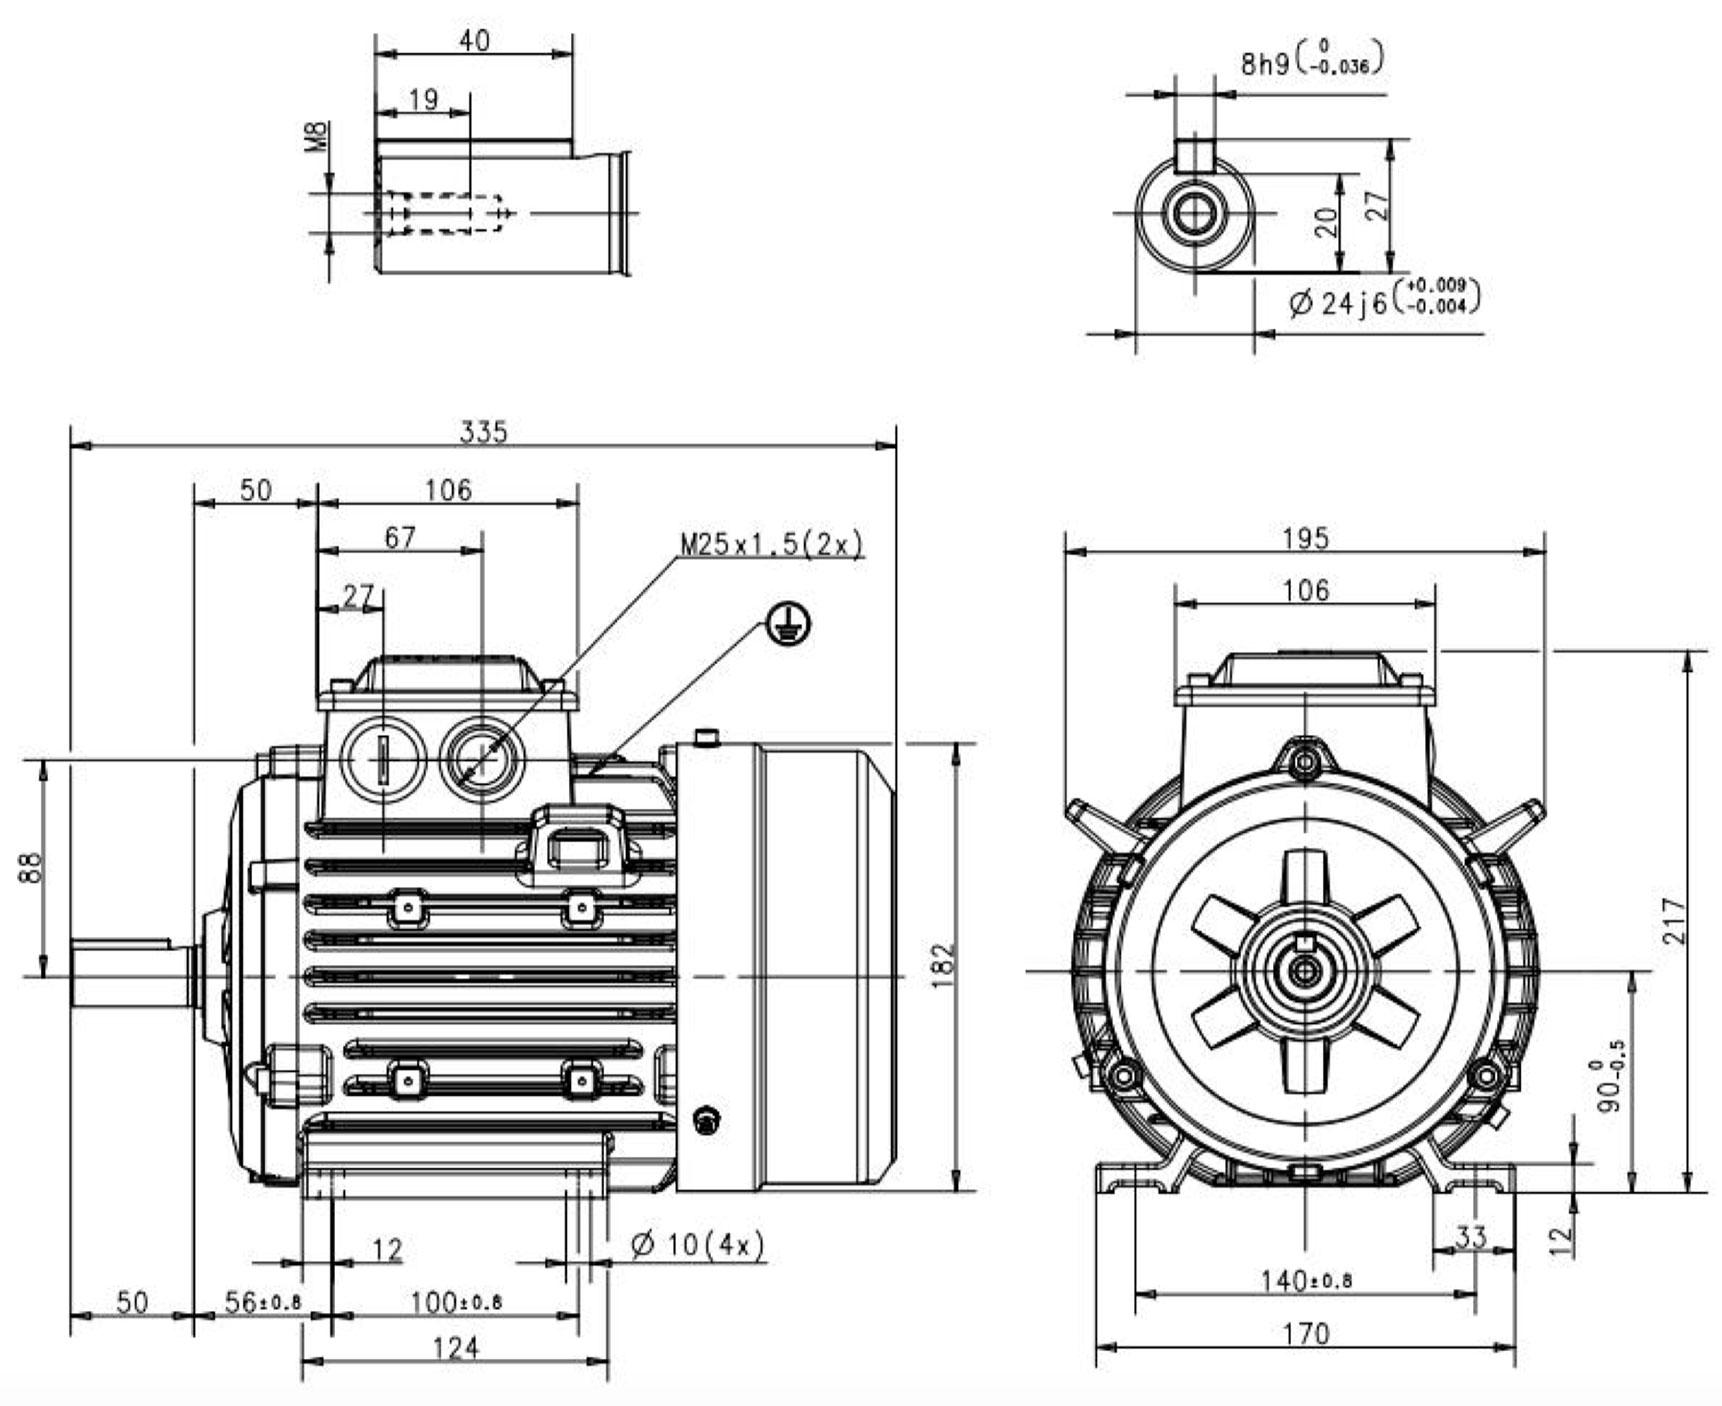 moteur triphas u00e9 1 1 kw  1500 tr  min  b3  400  690v